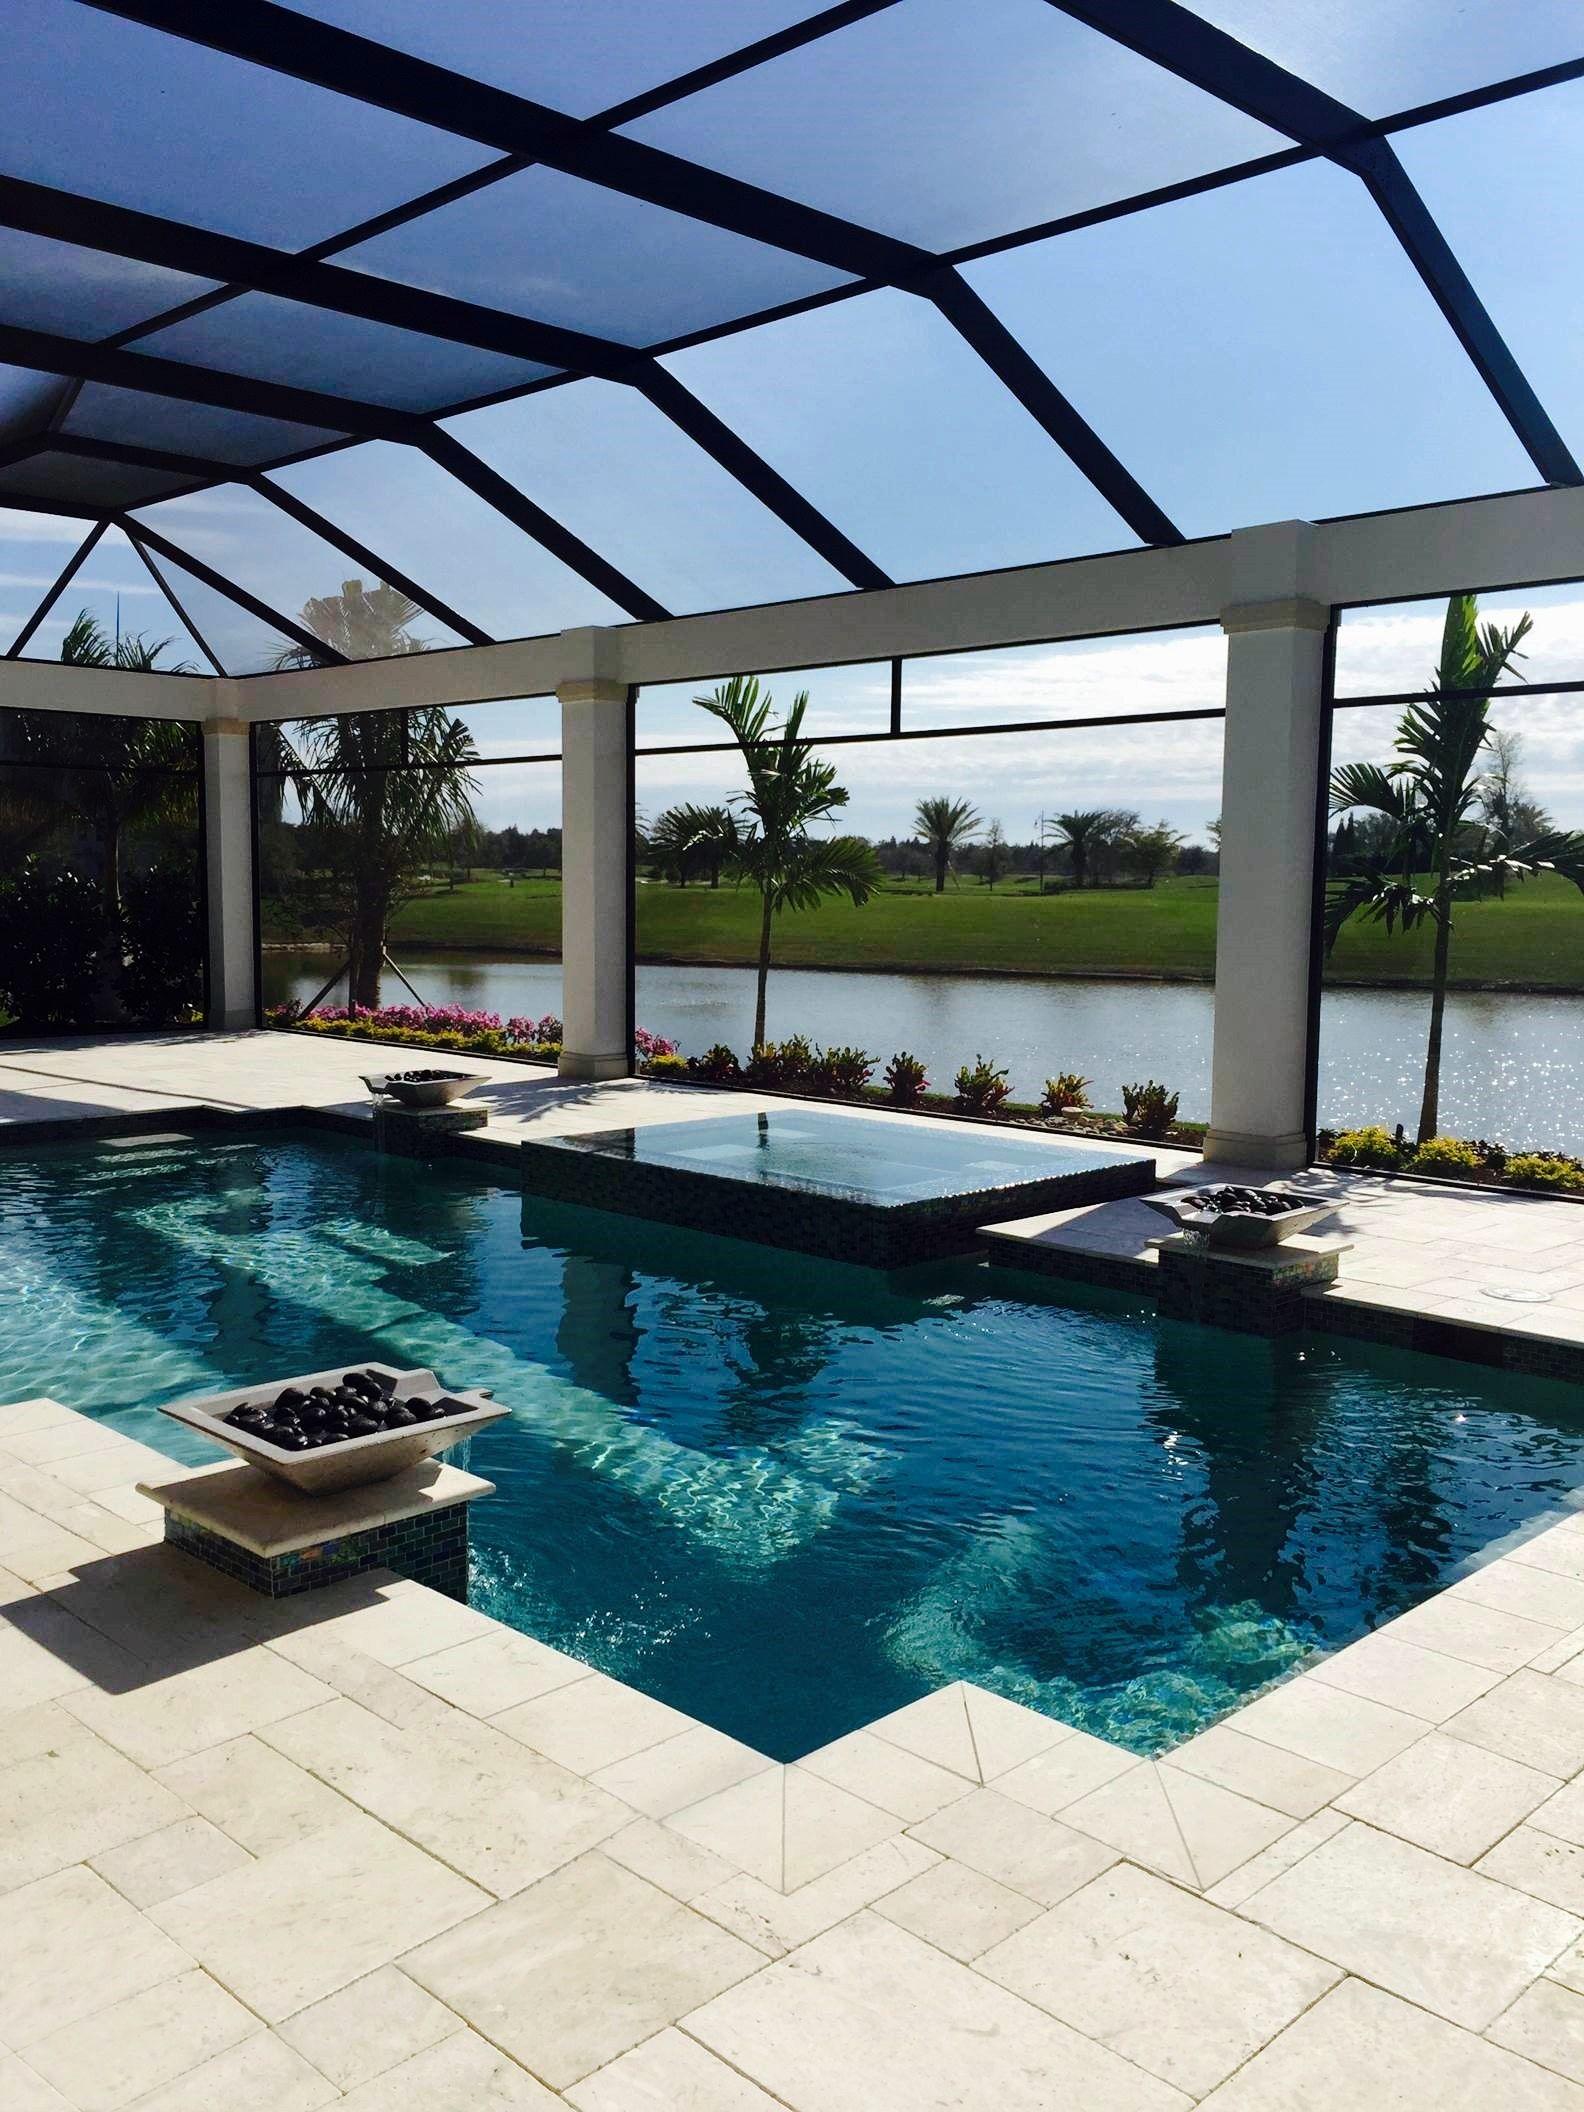 Pool Patio Flooring Ideas